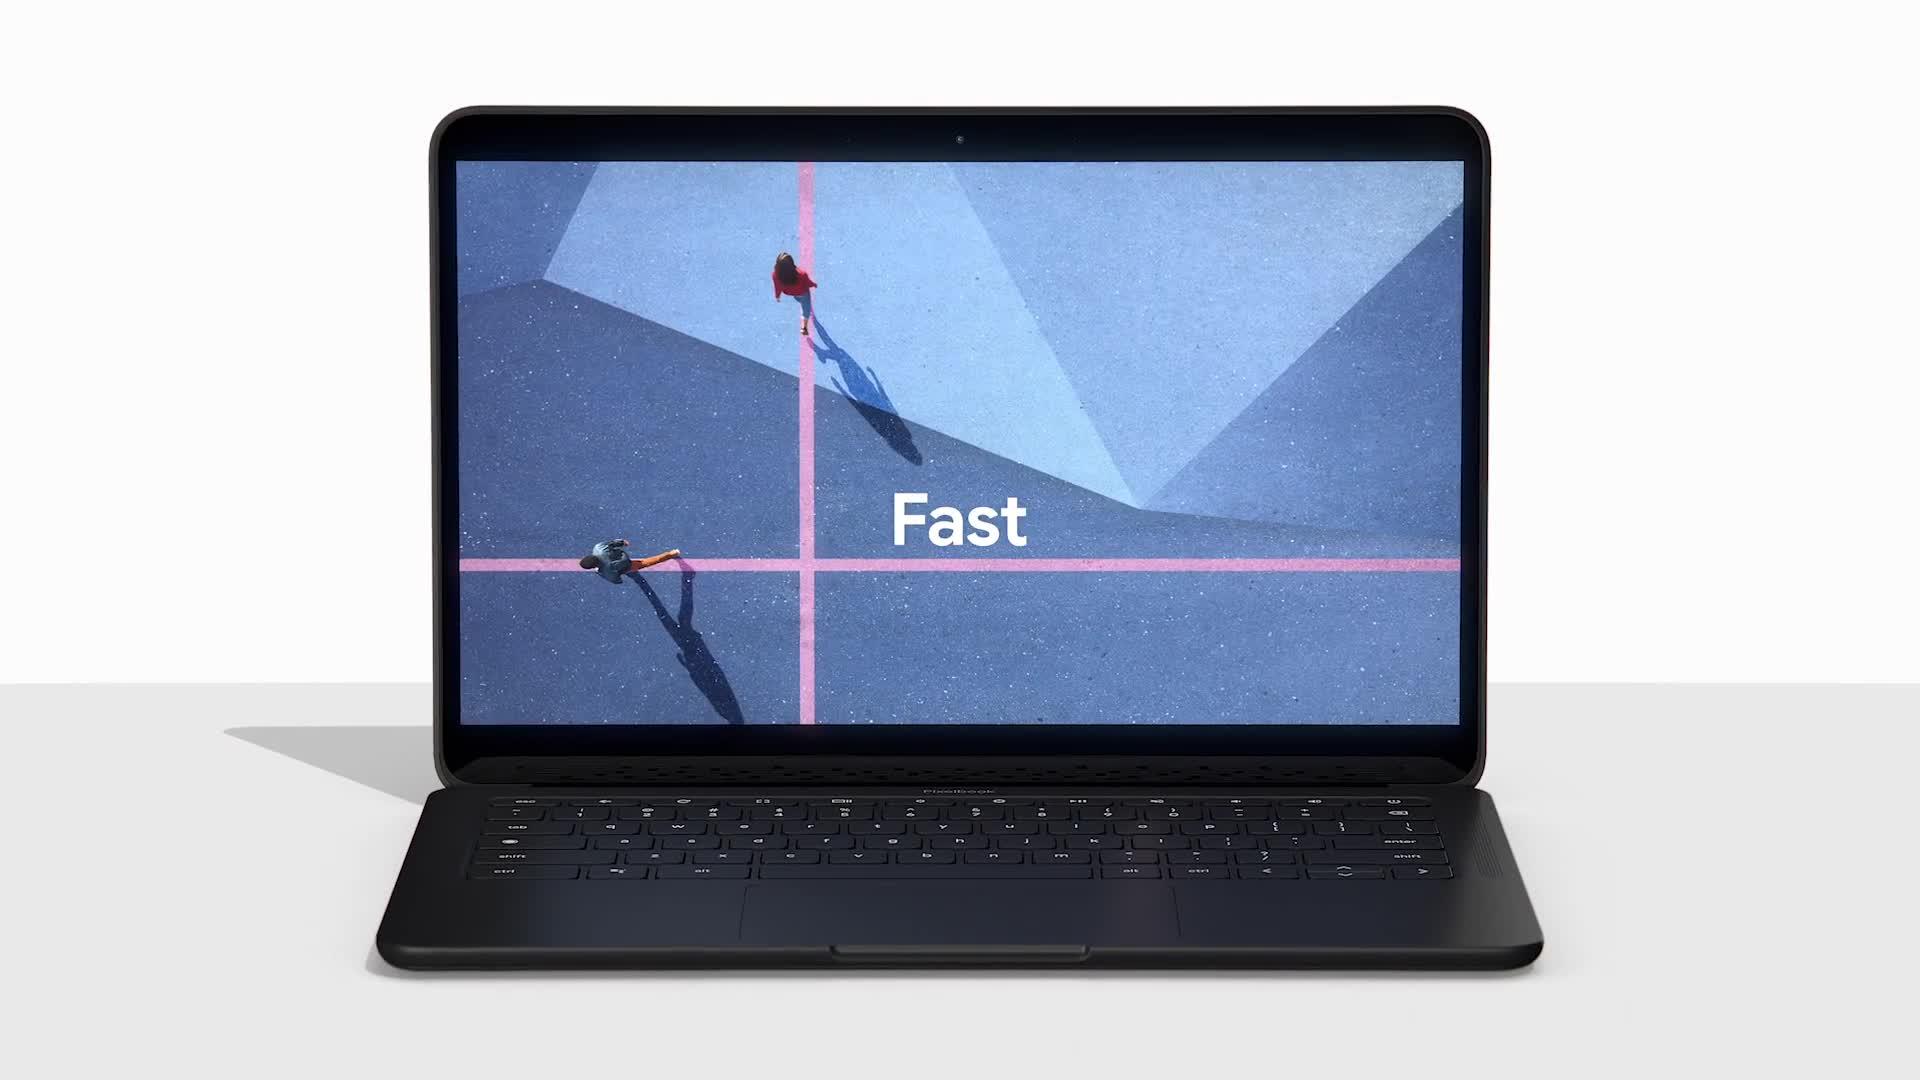 Google, Notebook, Laptop, Chromebook, Google Pixelbook, Pixelbook Go, Google Pixelbook Go